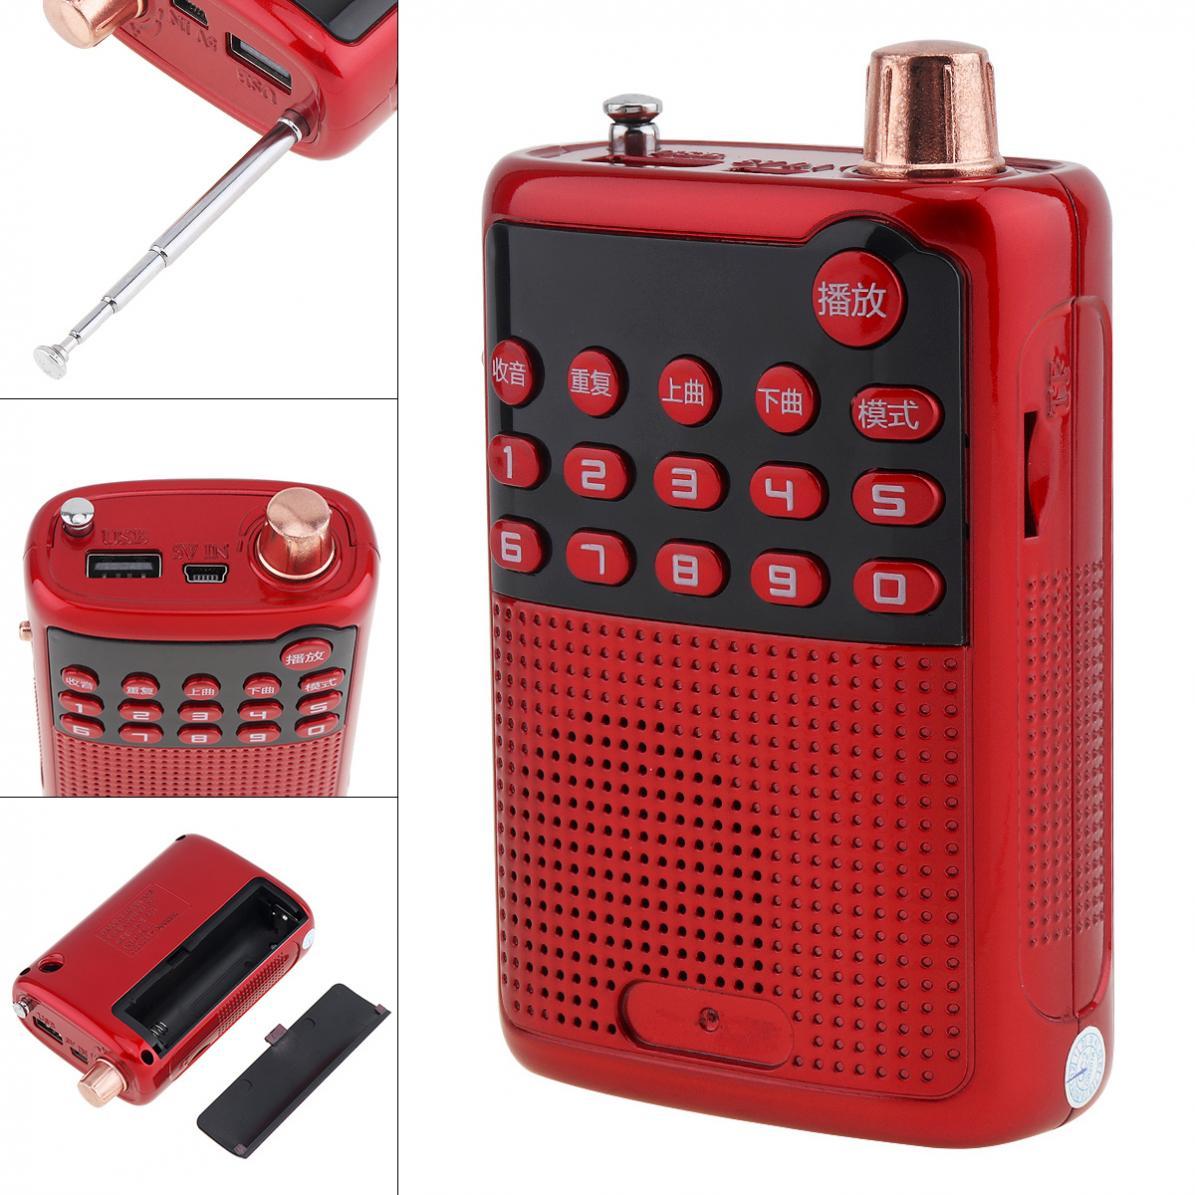 E55 Tragbare Radio Mini Audio Karte Lautsprecher Fm Radio Mit 3,5mm Kopfhörer Jack Für Outdoor/home Radio Unterhaltungselektronik